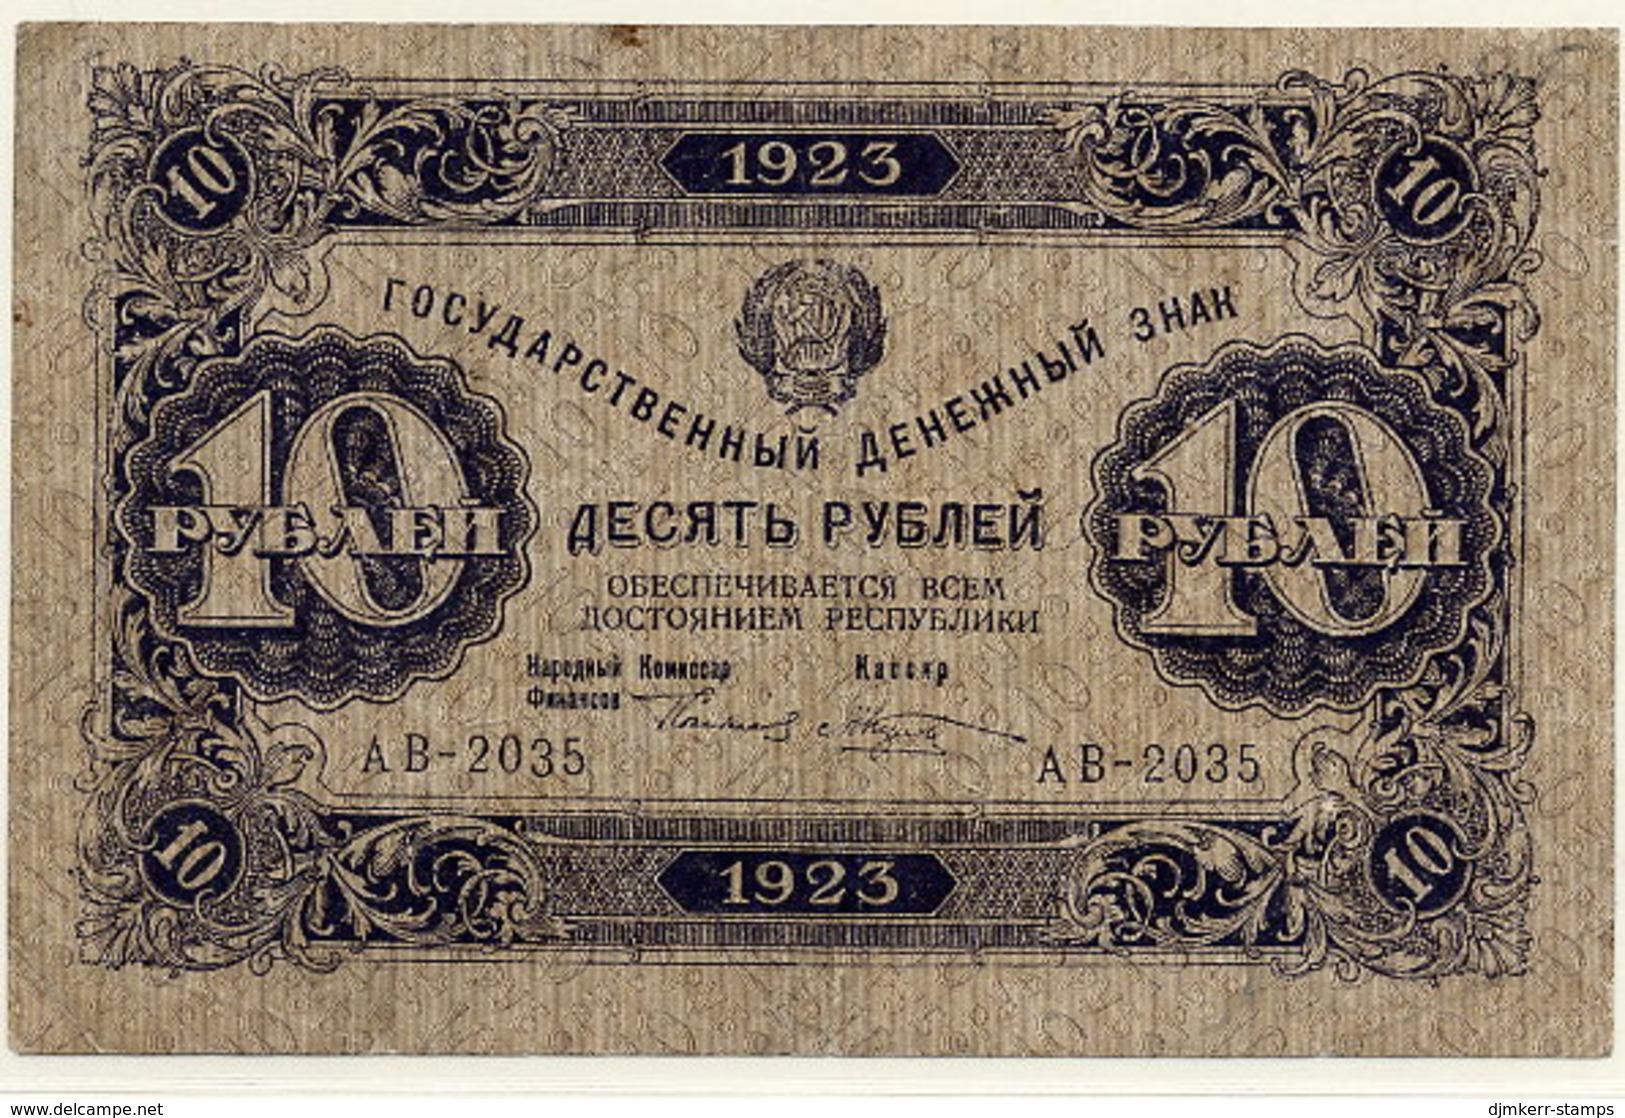 RSFSR 1923 10 Rub. 1st Issue XF  P157 - Russia